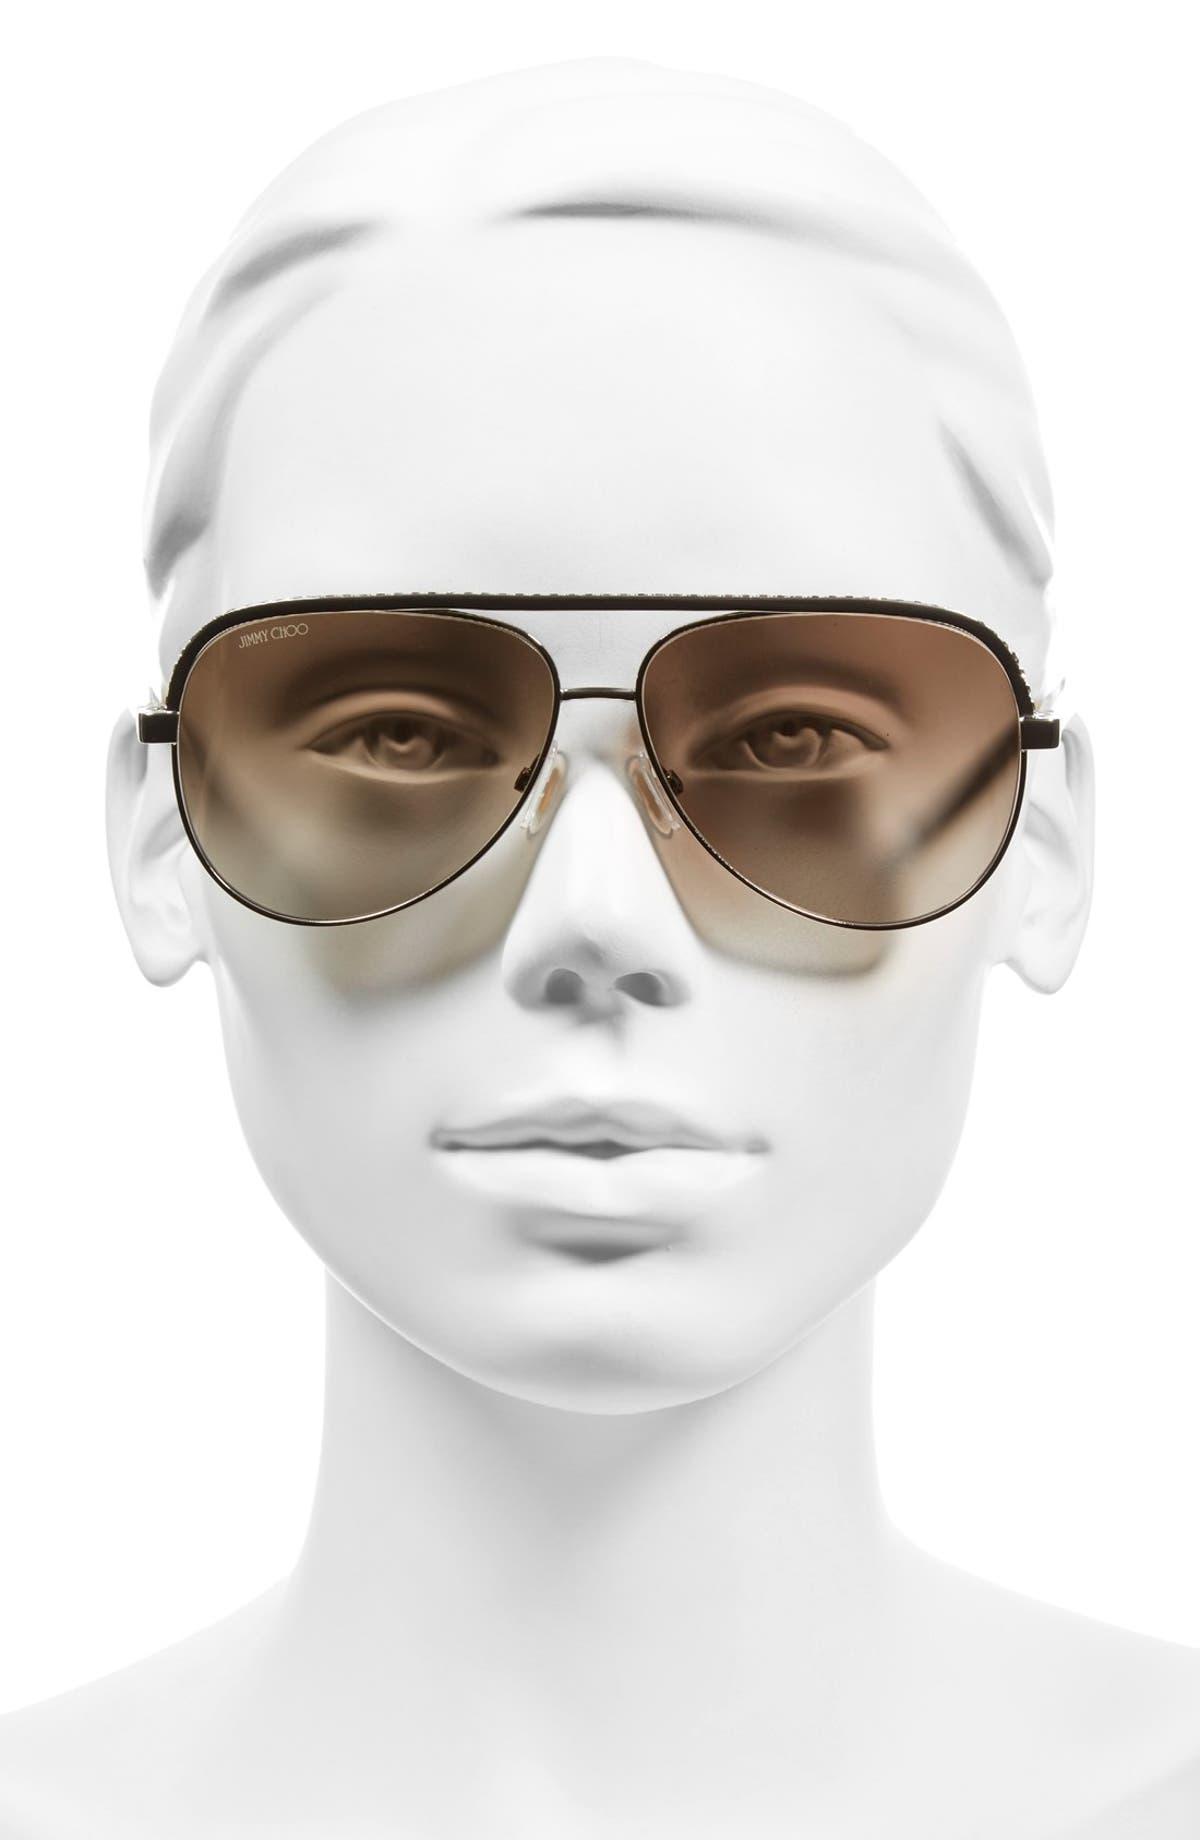 6a39ee6c41da Jimmy Choo  Linas  59mm Aviator Sunglasses